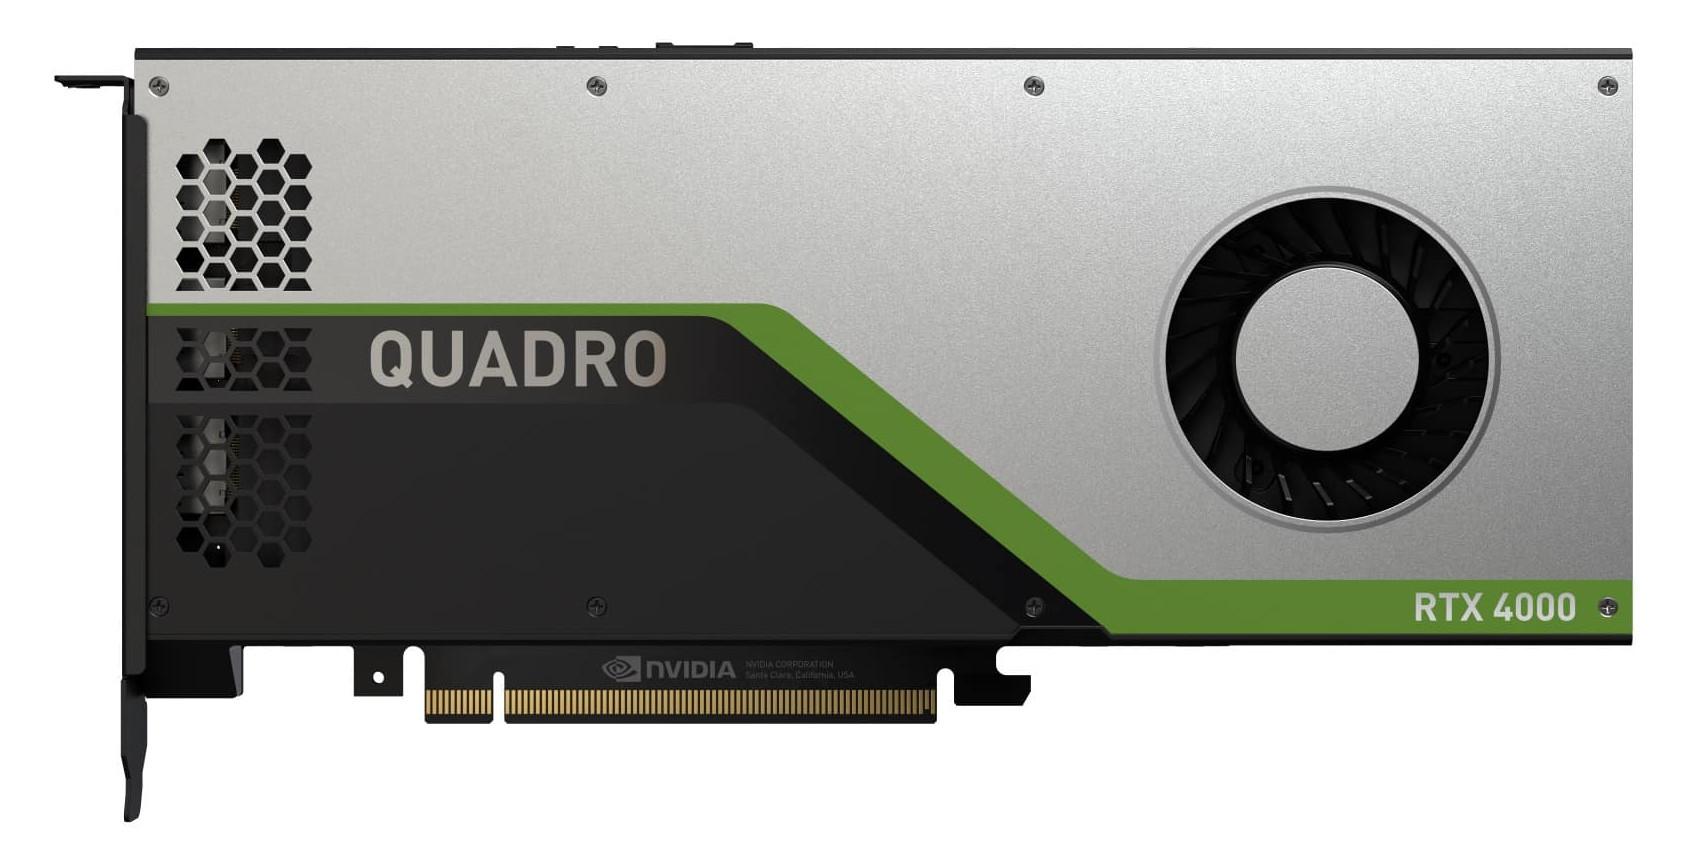 Dell R740搭配NVIDIA工作站繪圖卡之Proxmox VE PCI-E透通設定實作與效能測試